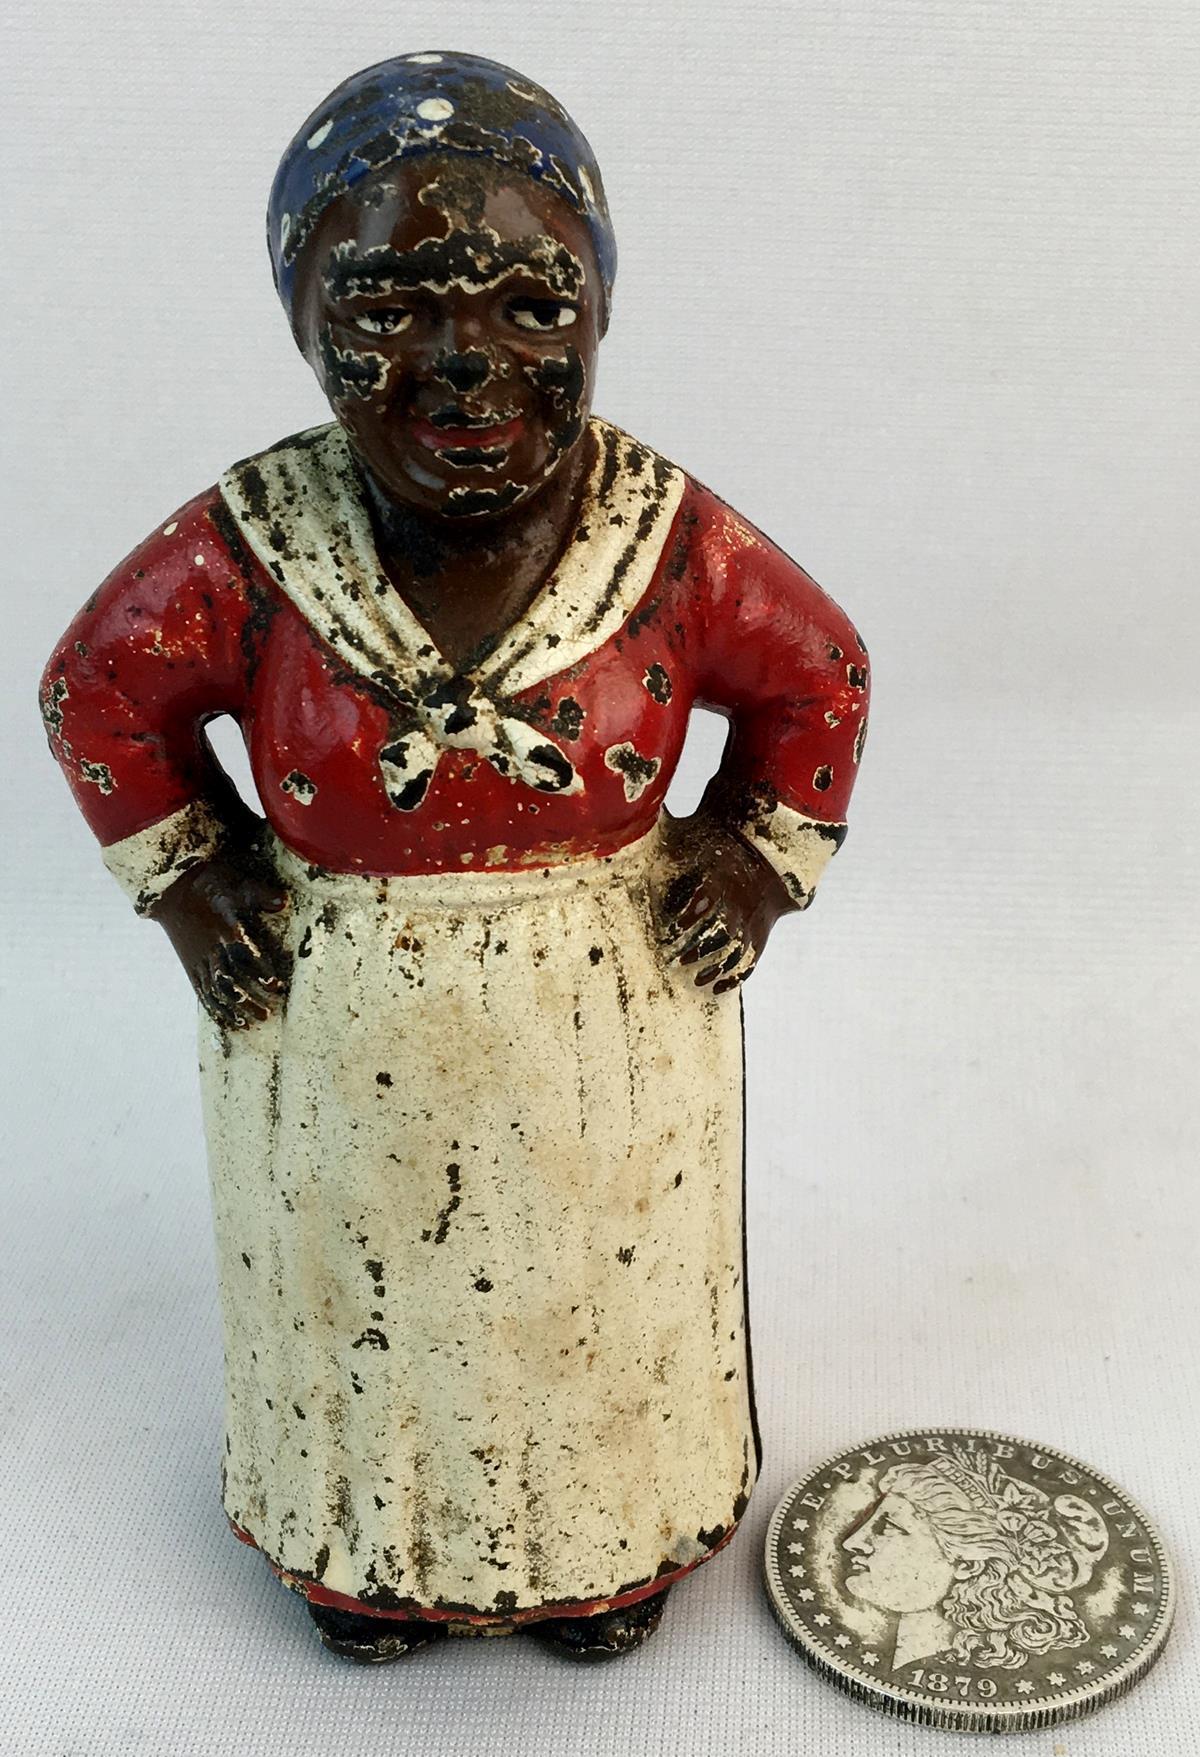 Antique c. 1920 Hubley Black Americana Aunt Jemima Cast Iron Still Bank